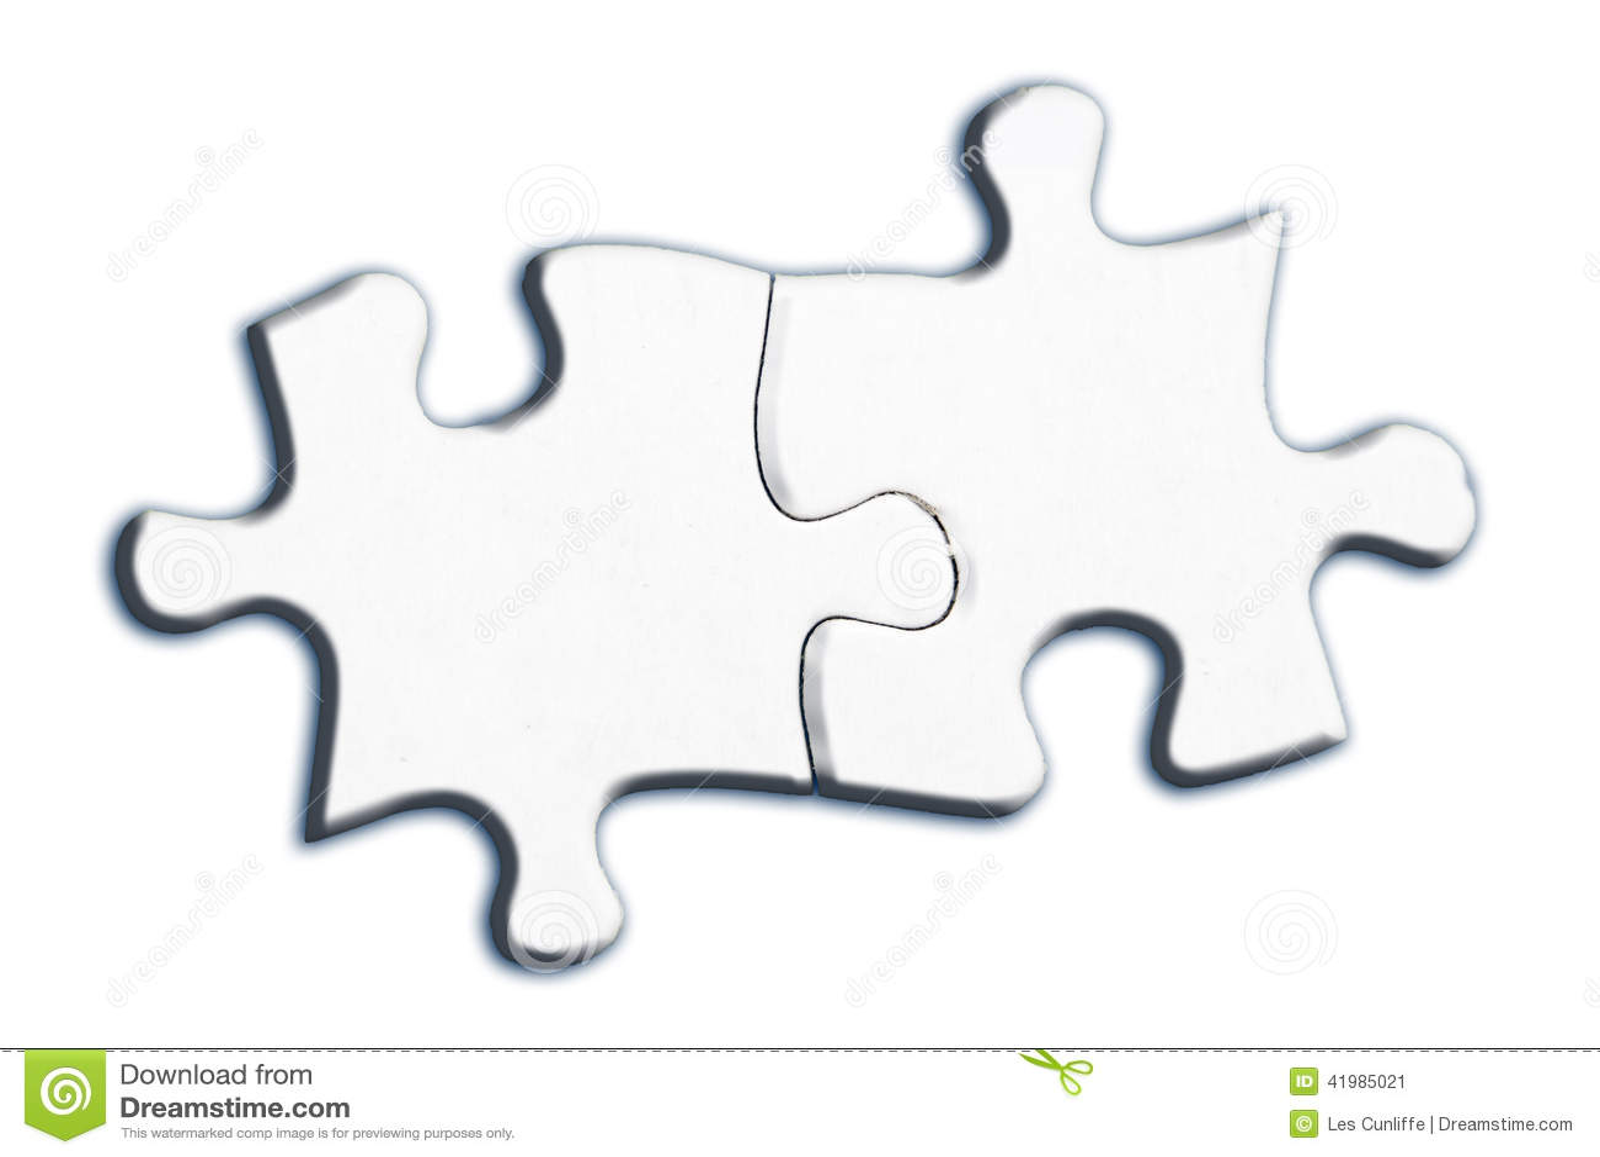 puzzle pieces stock photo  image 41985021